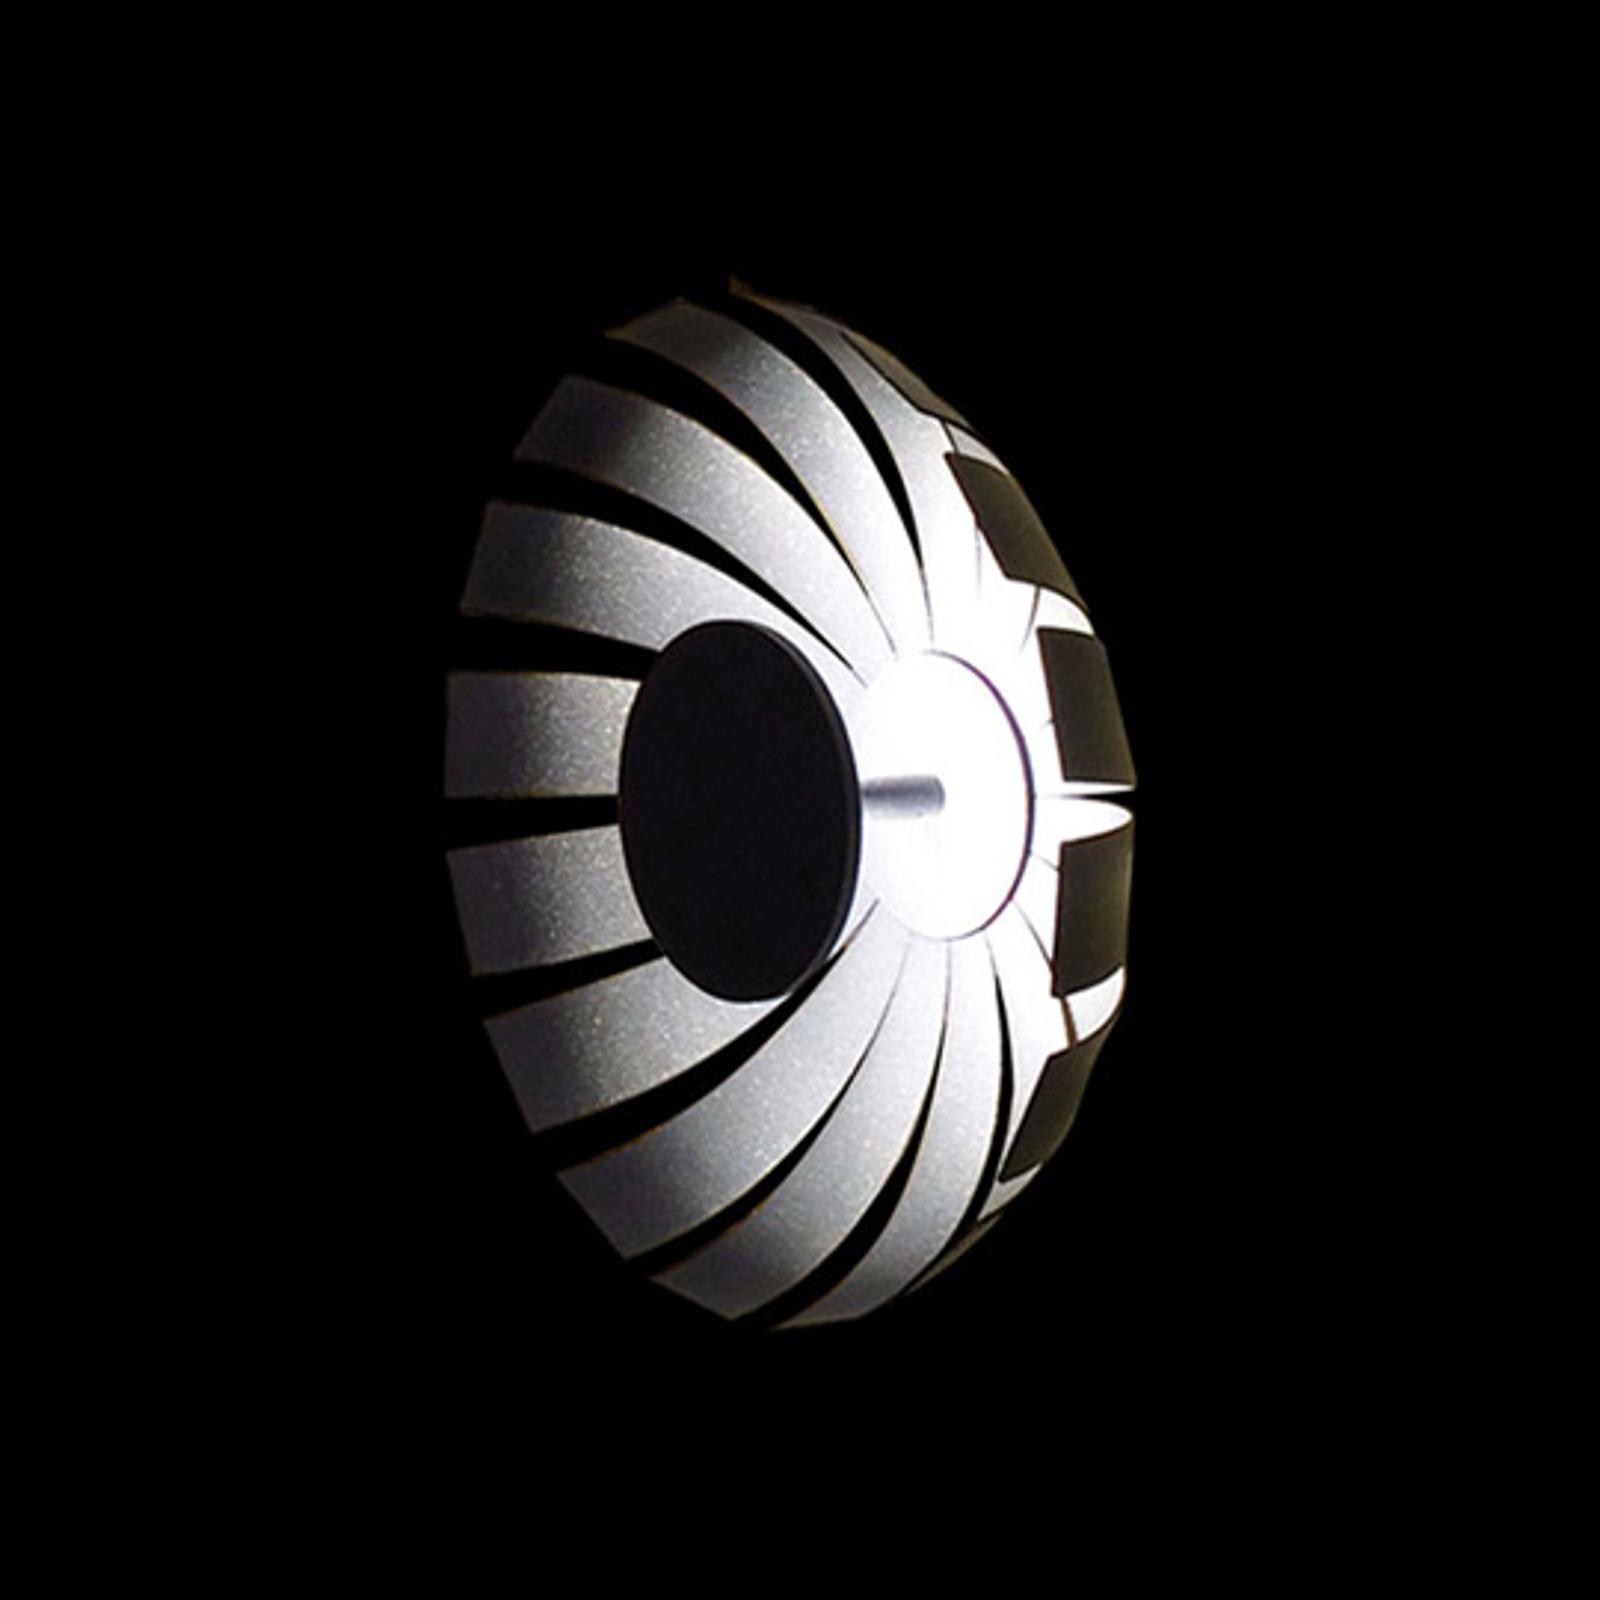 LED design plafondlamp Loto, antraciet, 20 cm